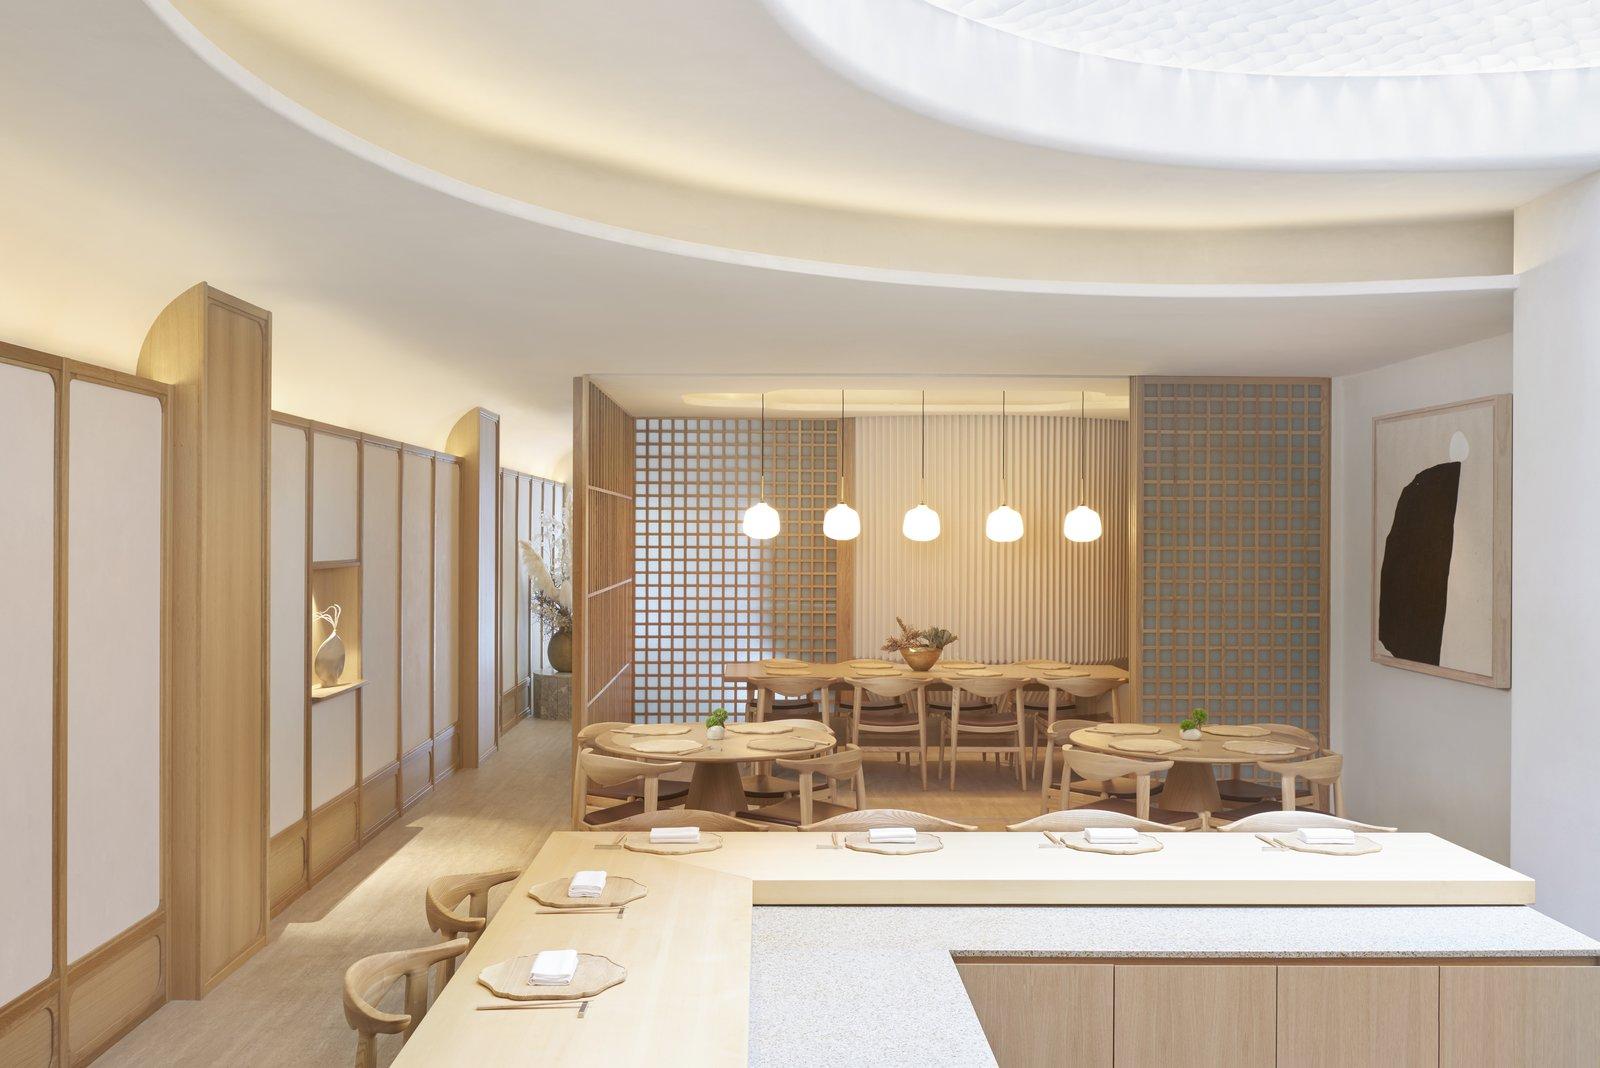 Esora Kappo style dining room